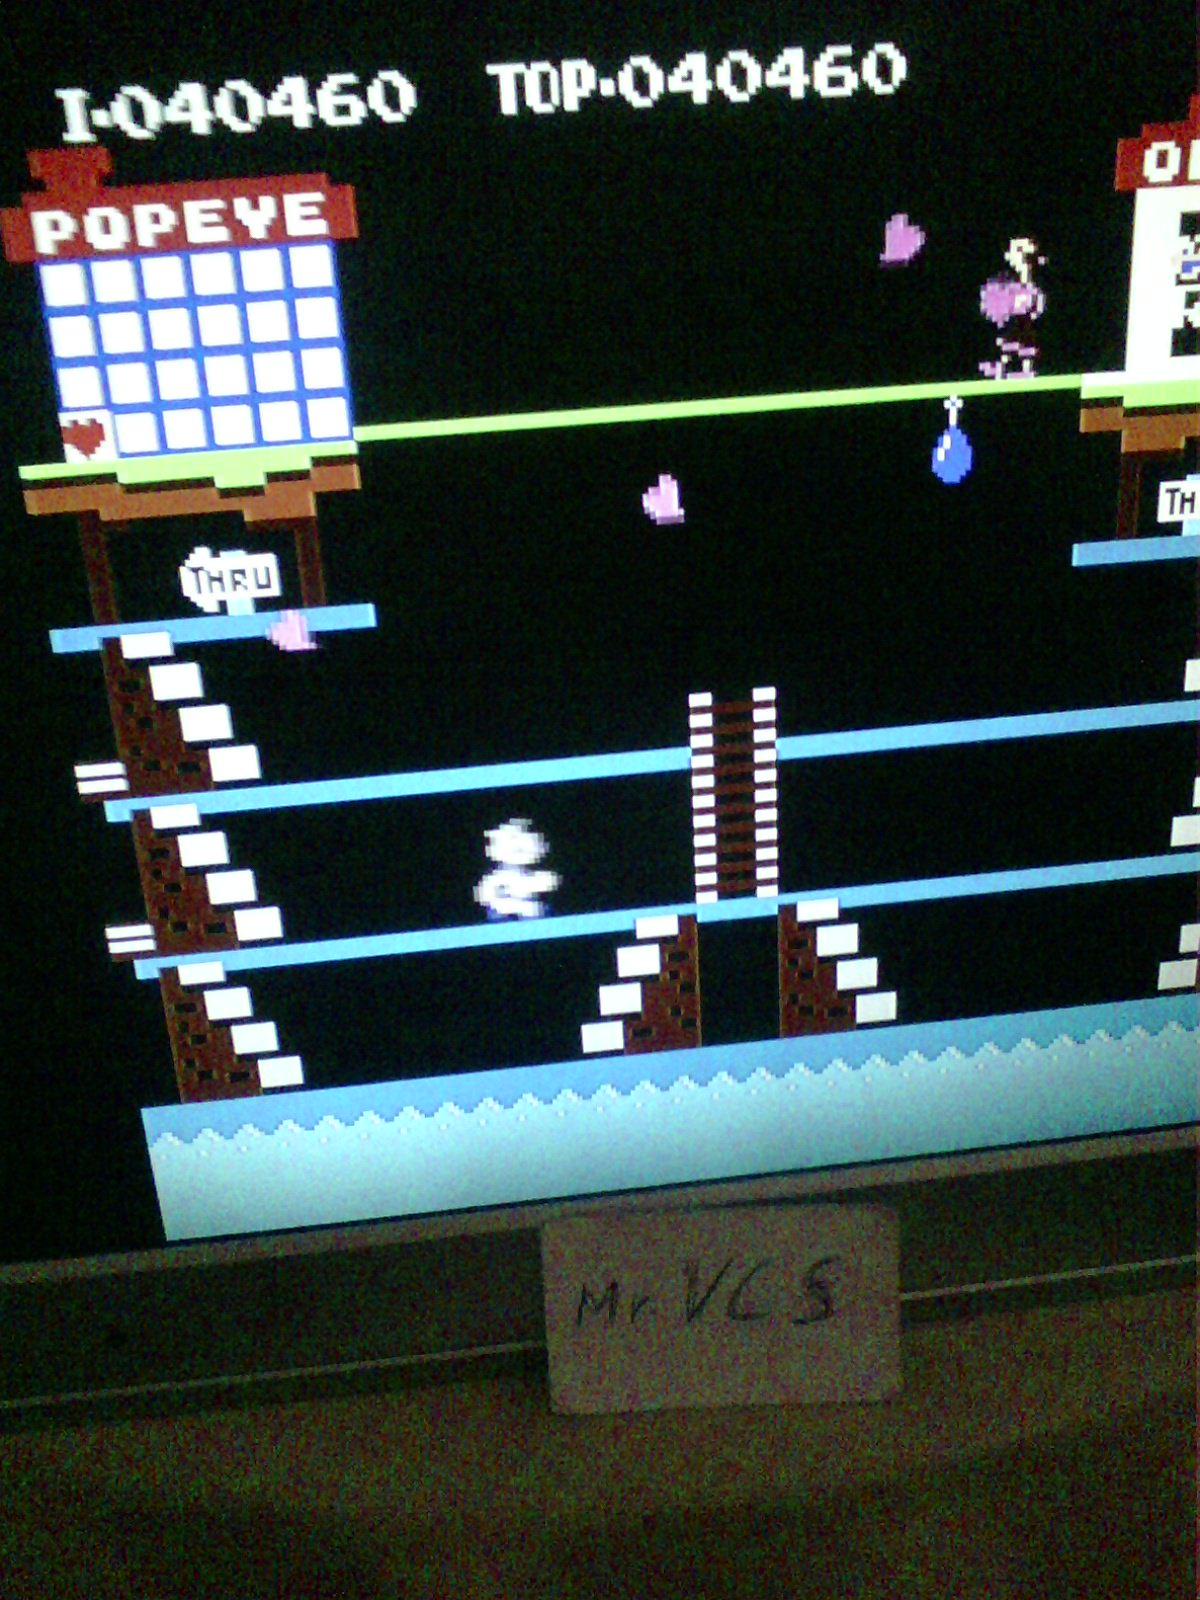 MisterVCS: Popeye (NES/Famicom Emulated) 40,460 points on 2019-08-03 12:10:50